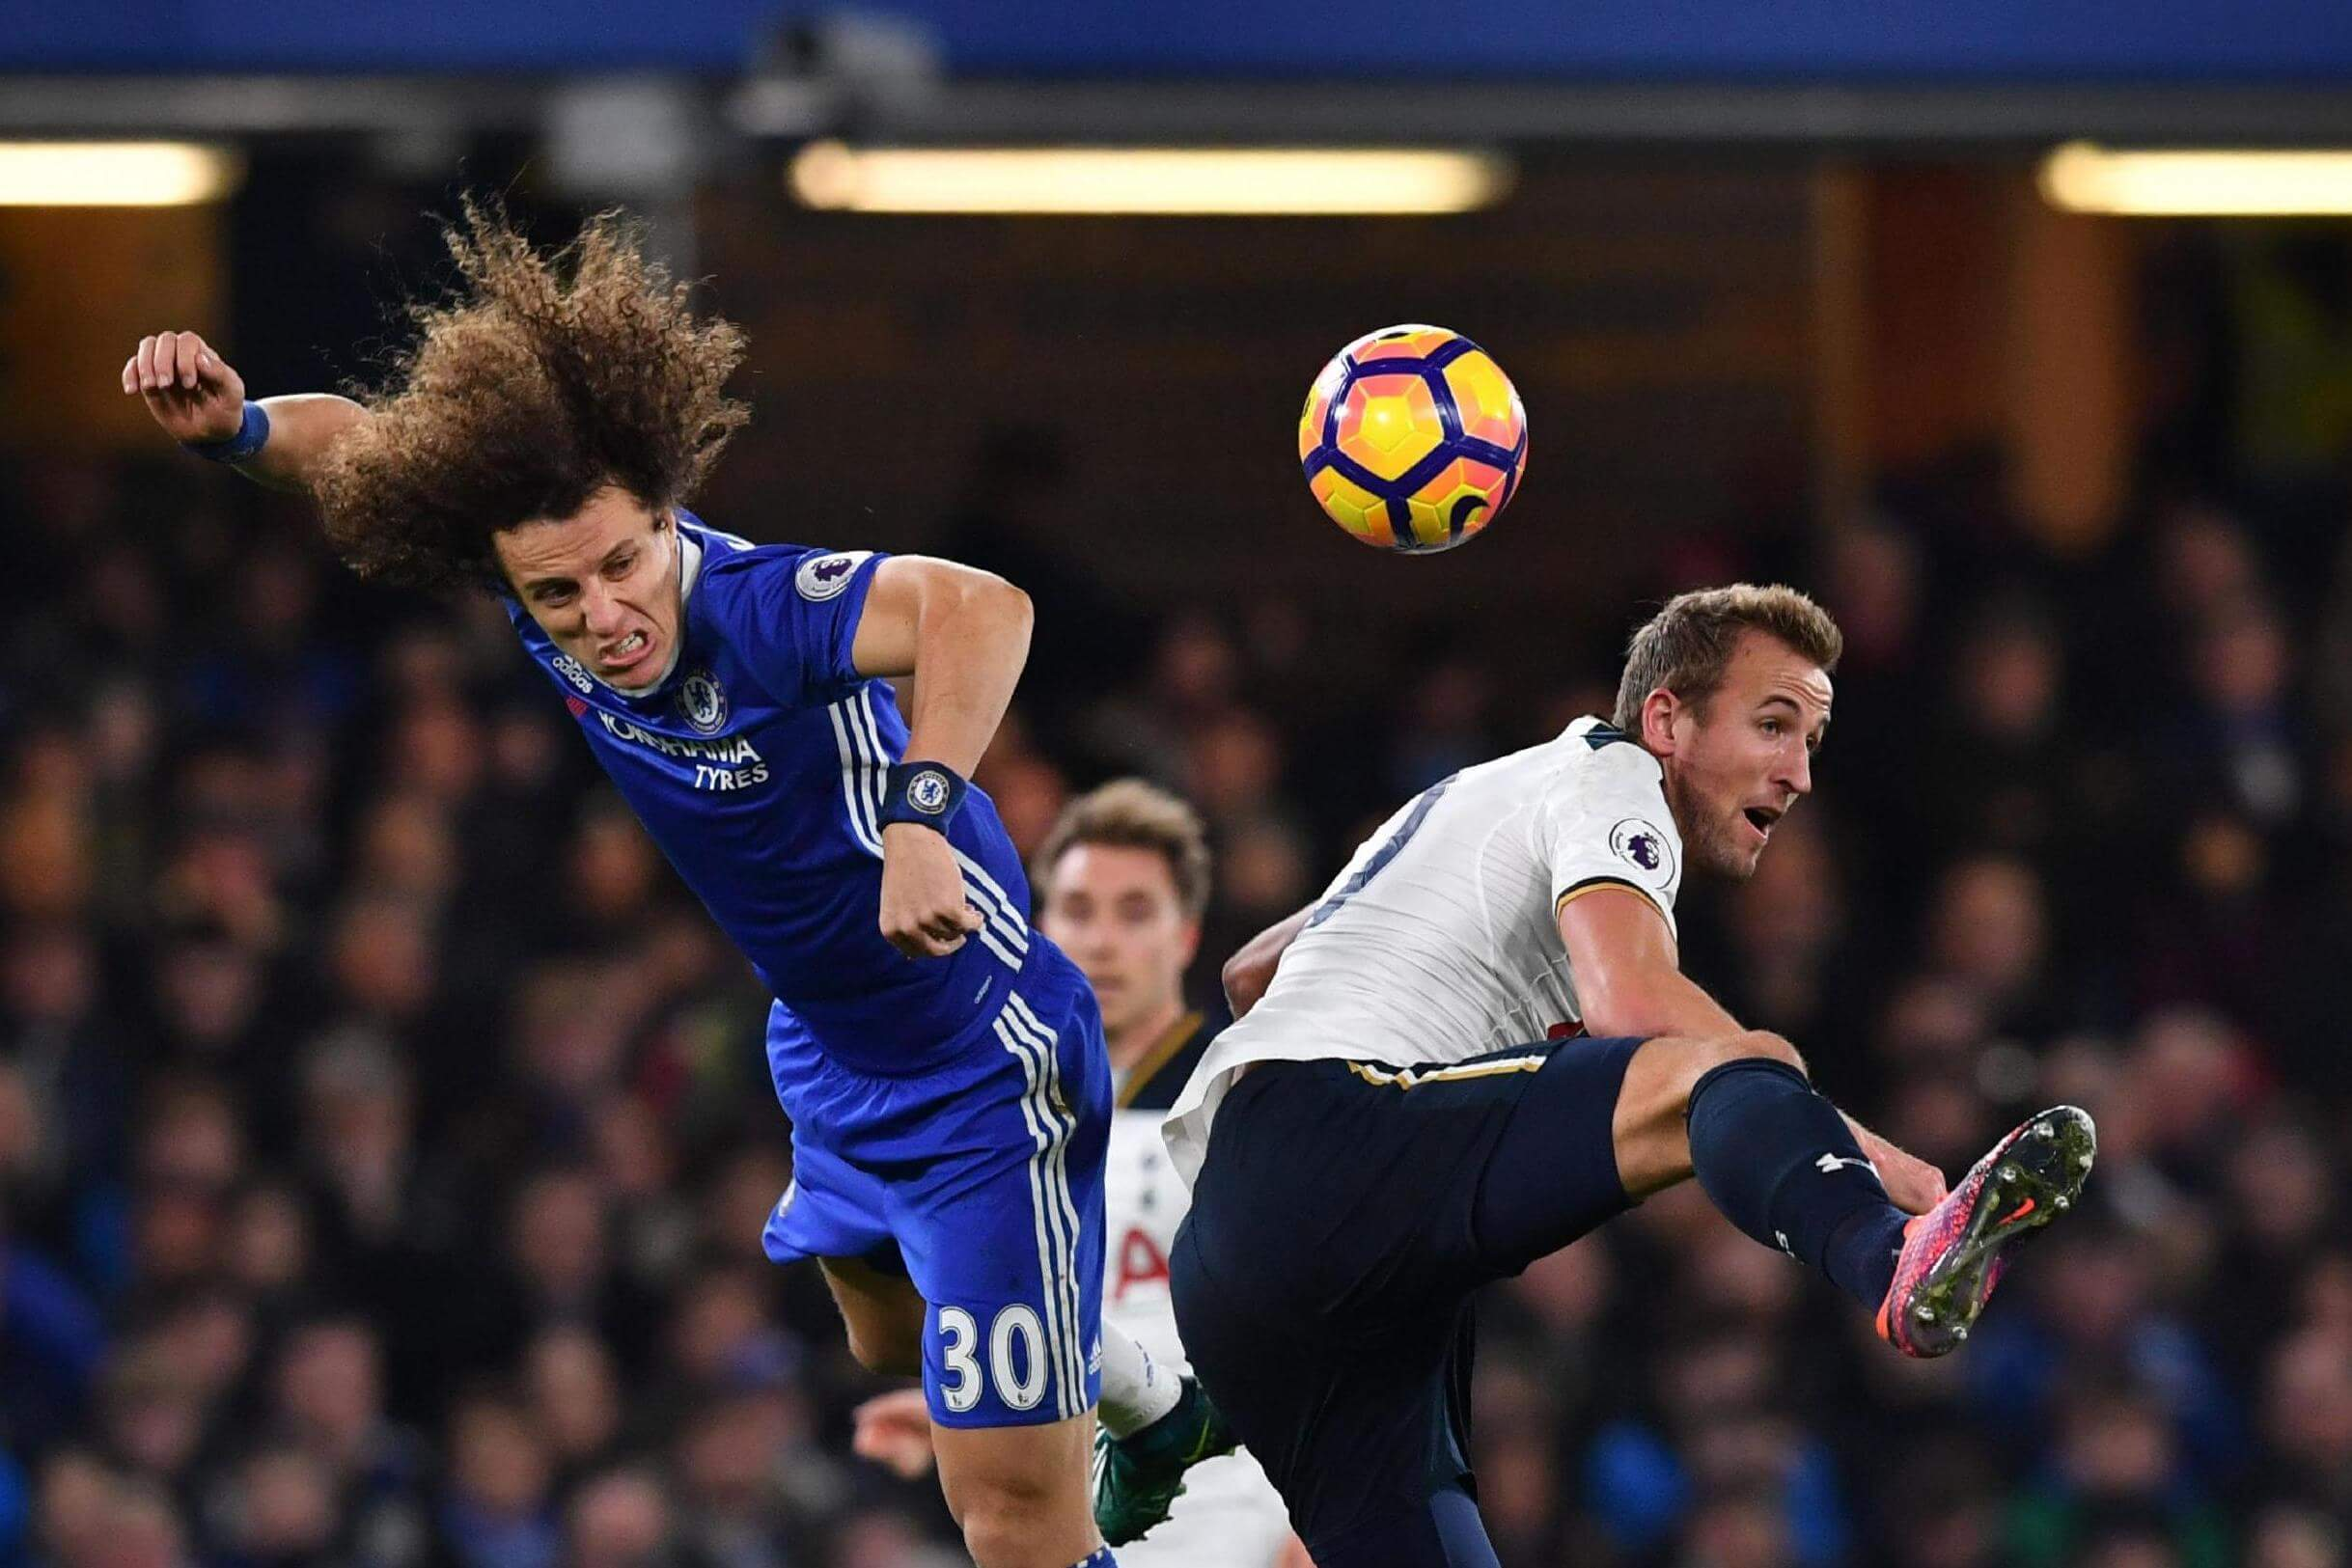 Chelsea FC vs Tottenham Hotspurs